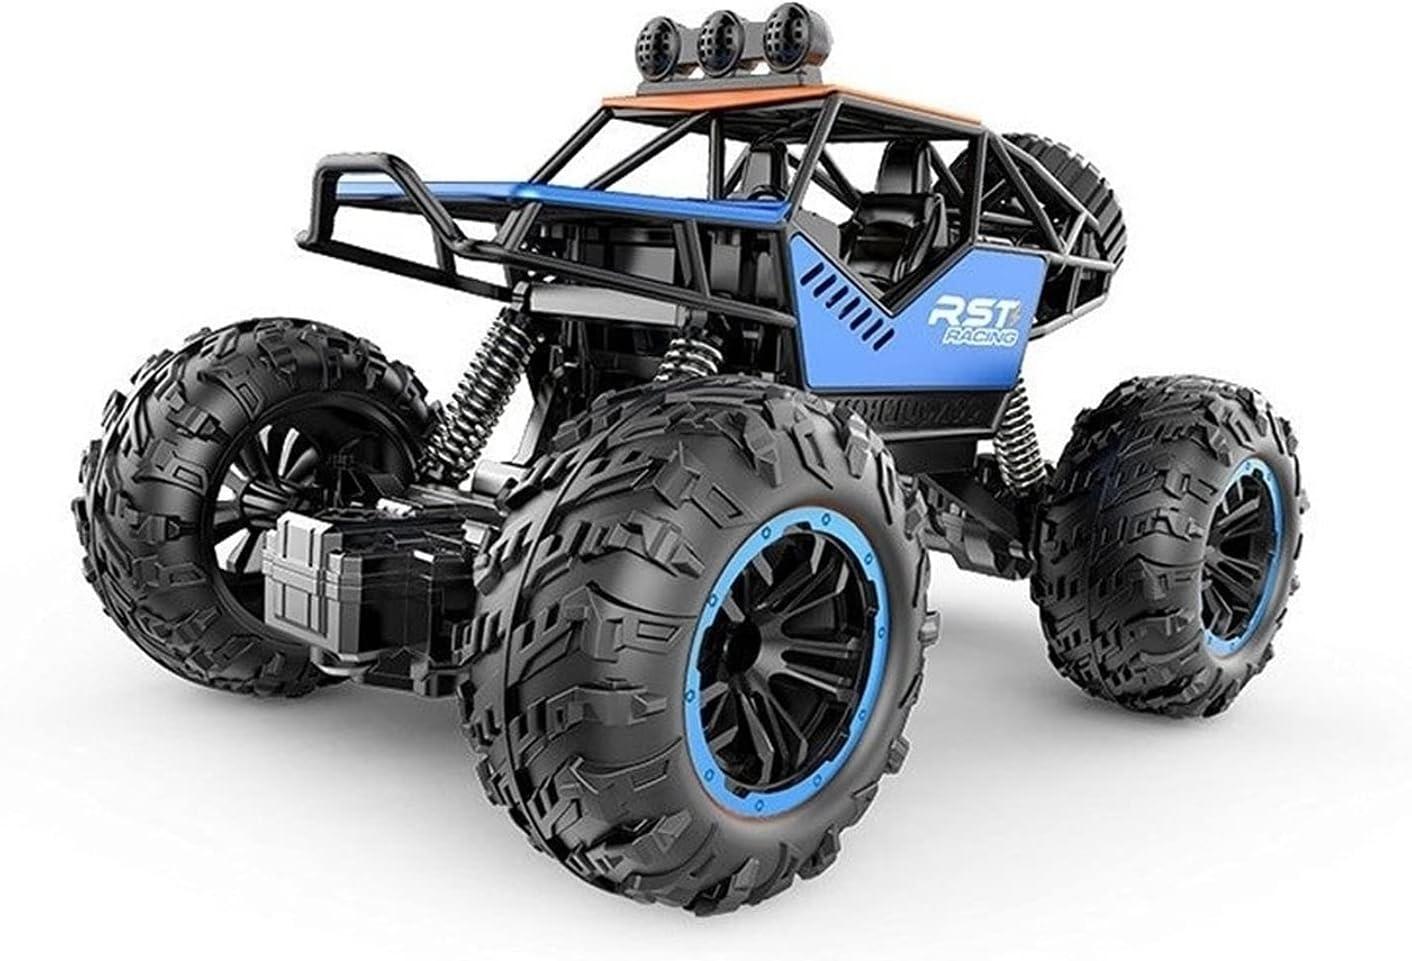 MUMUMI 4WD High-Speed Dual-Motor RC Racing Sho Car Big 2.4G Sale price Tulsa Mall Tire